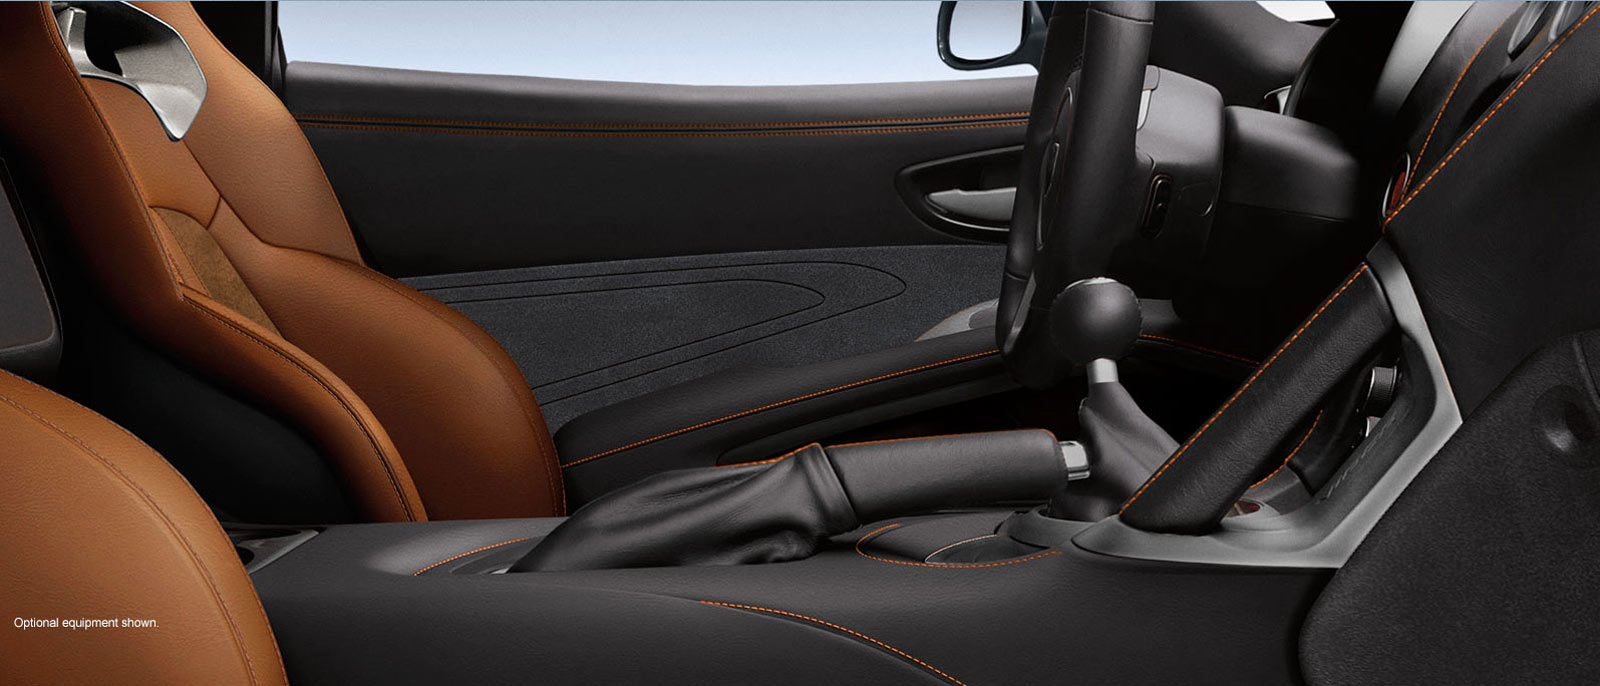 2015 Viper SRT interior